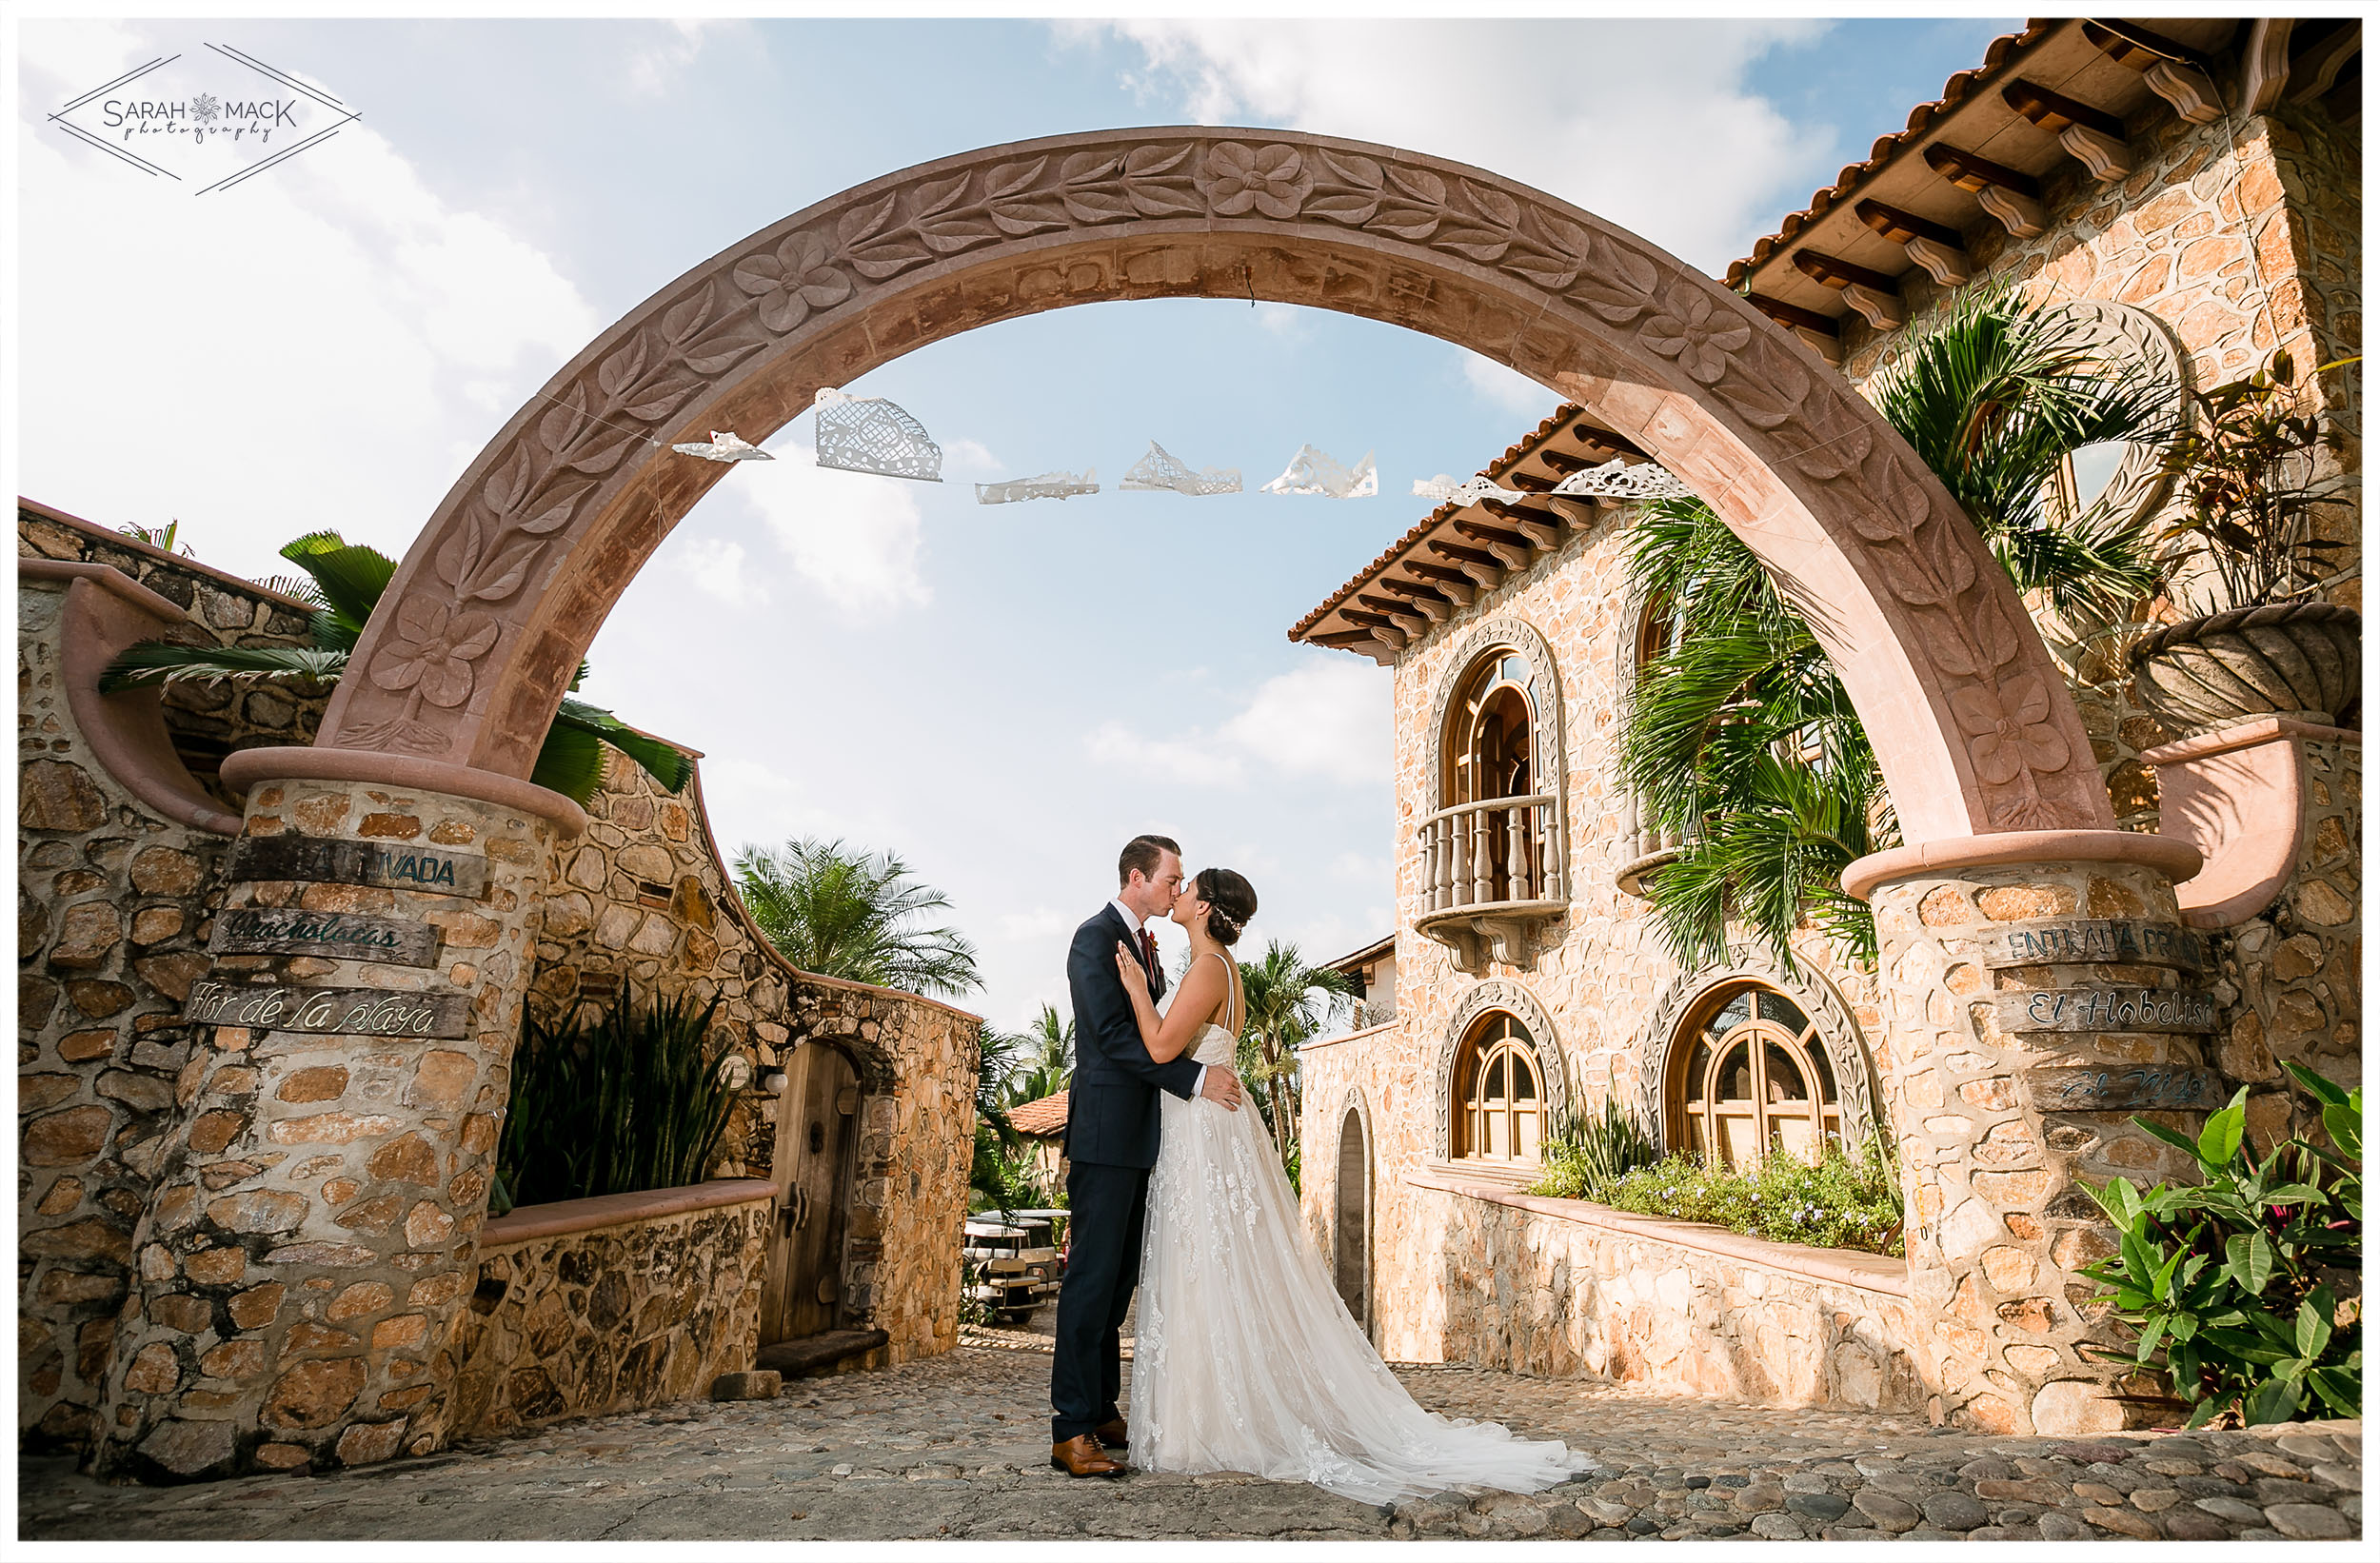 ES-Flor-de-Playa-Sayulita-Wedding-Photography-29.jpg